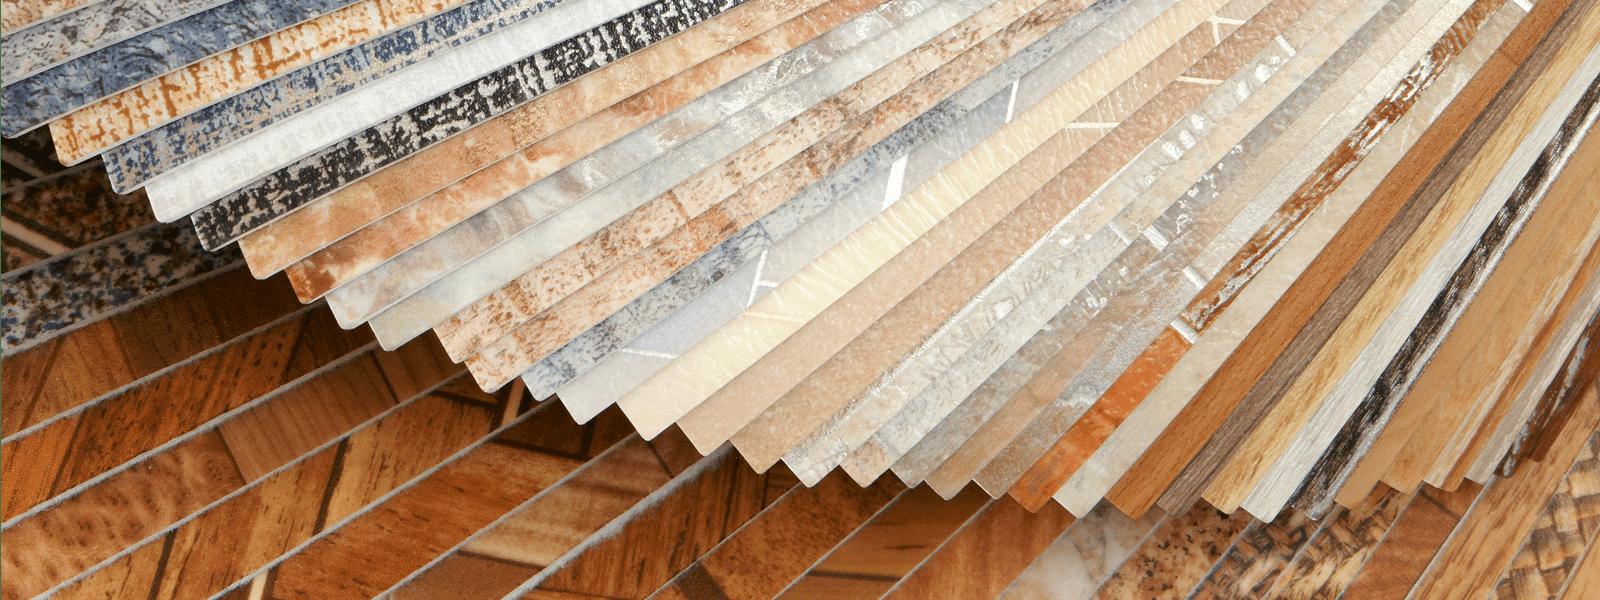 Resilient Vinyl Flooring Installation from Austin Flohr